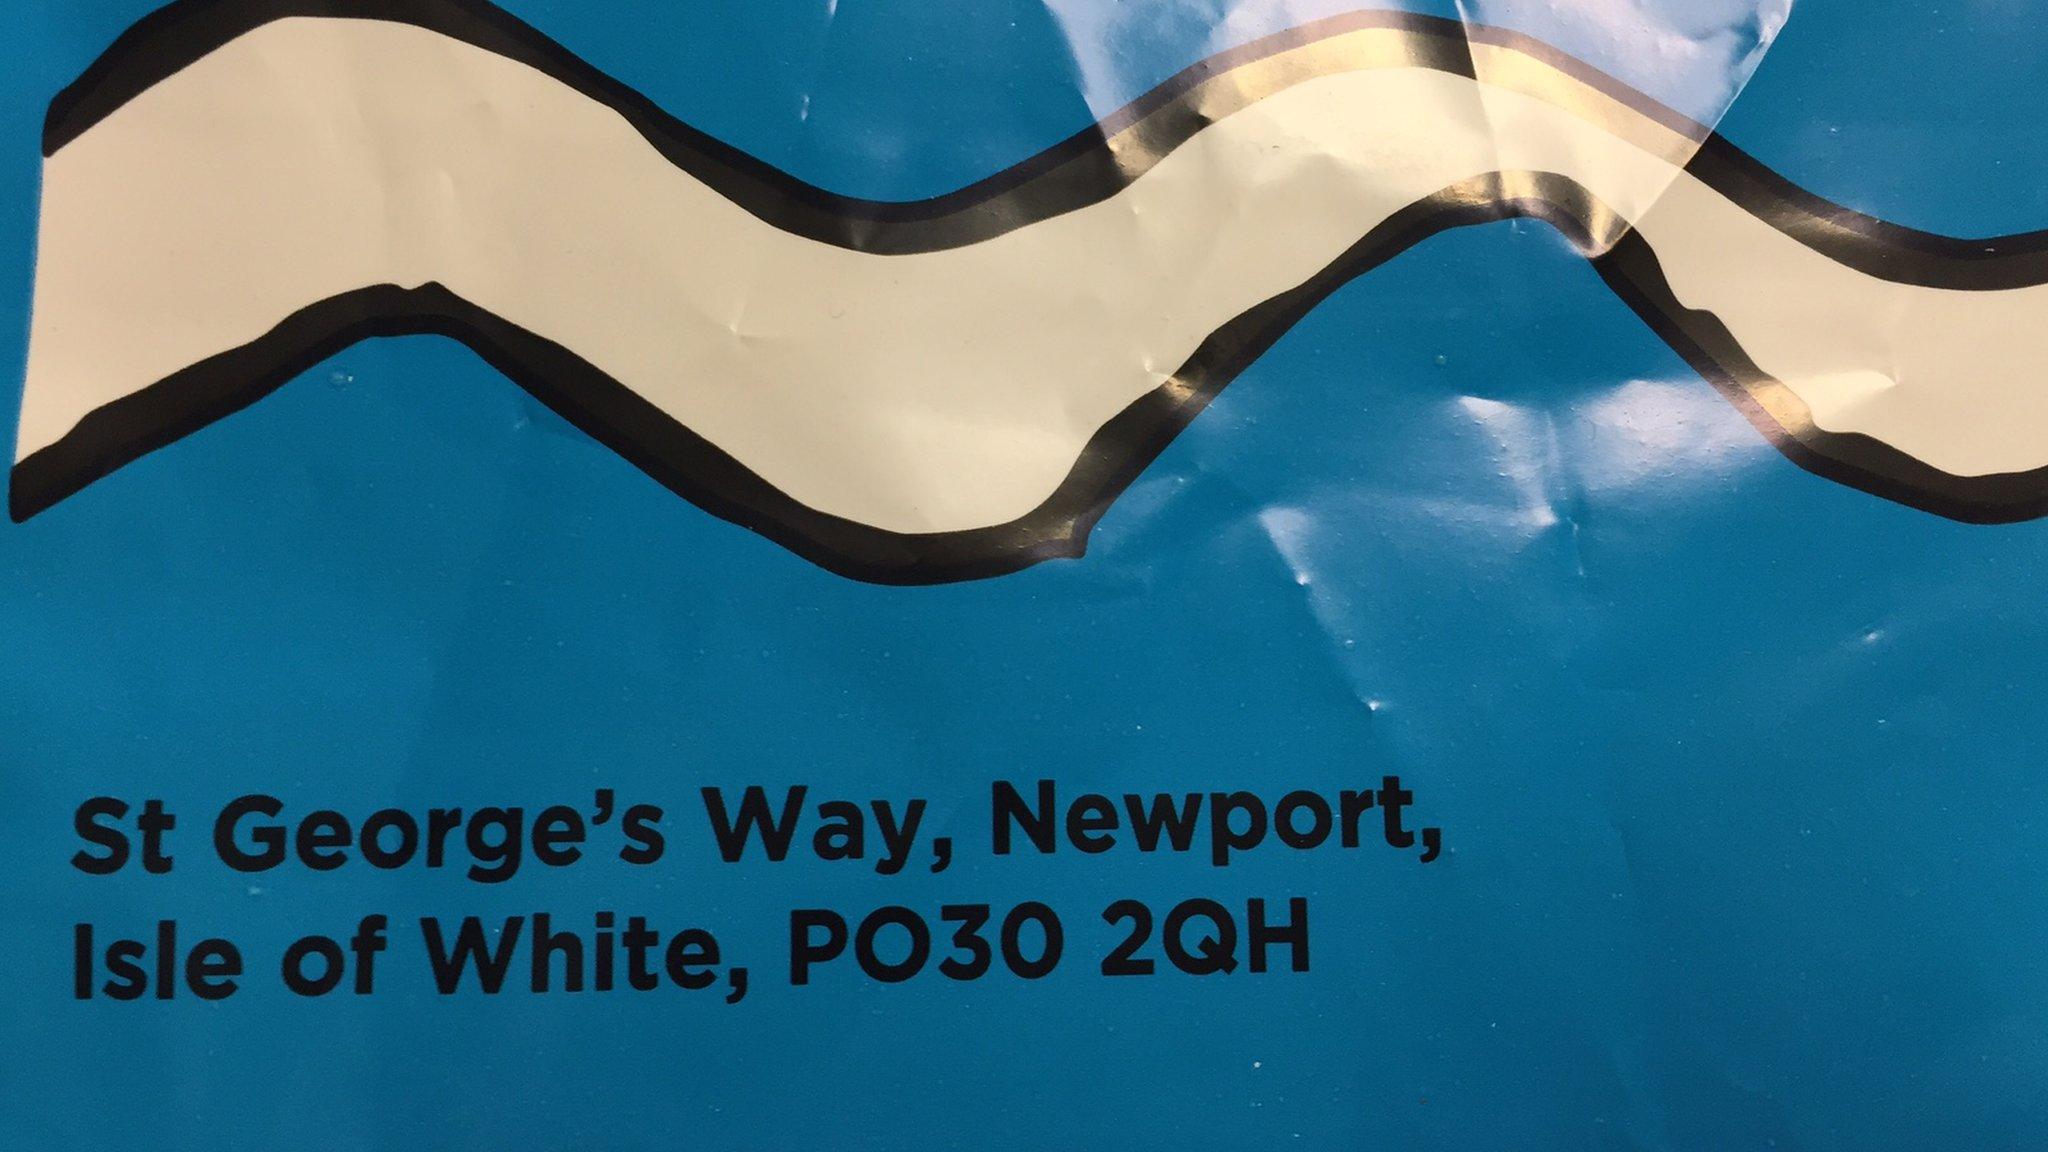 Asda sorry for 'Isle of White' shopping bag gaffe